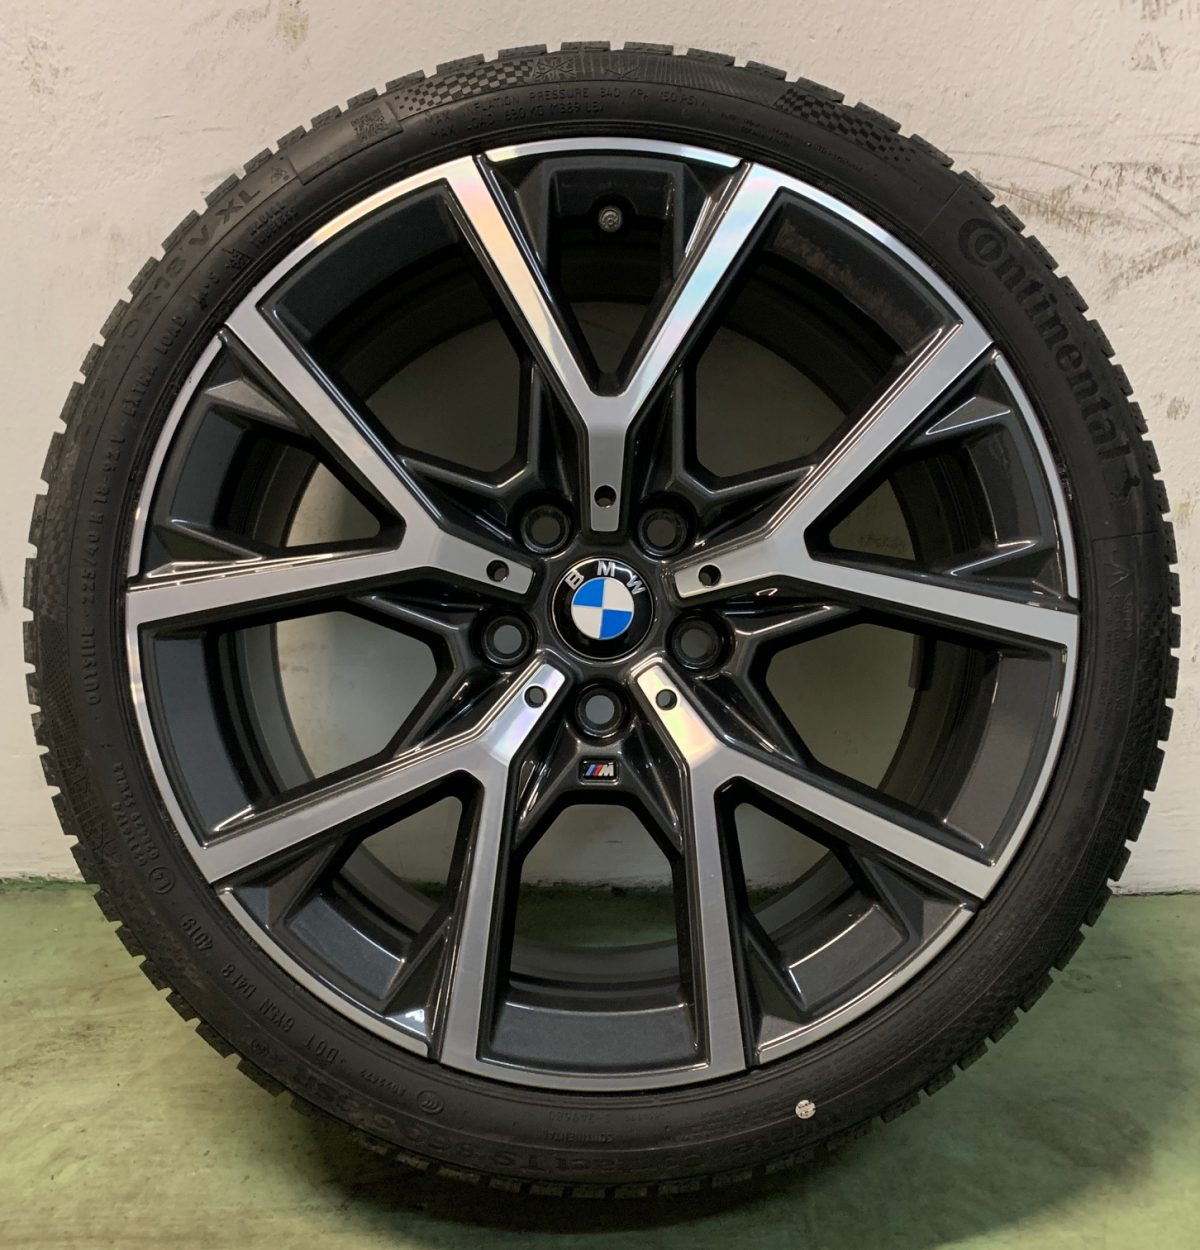 Gyári alufelni BMW új 1-es F40 (553M styl) 8X18 5x112 alufelni új télikerék-garnitúra Continental gumikkal 1